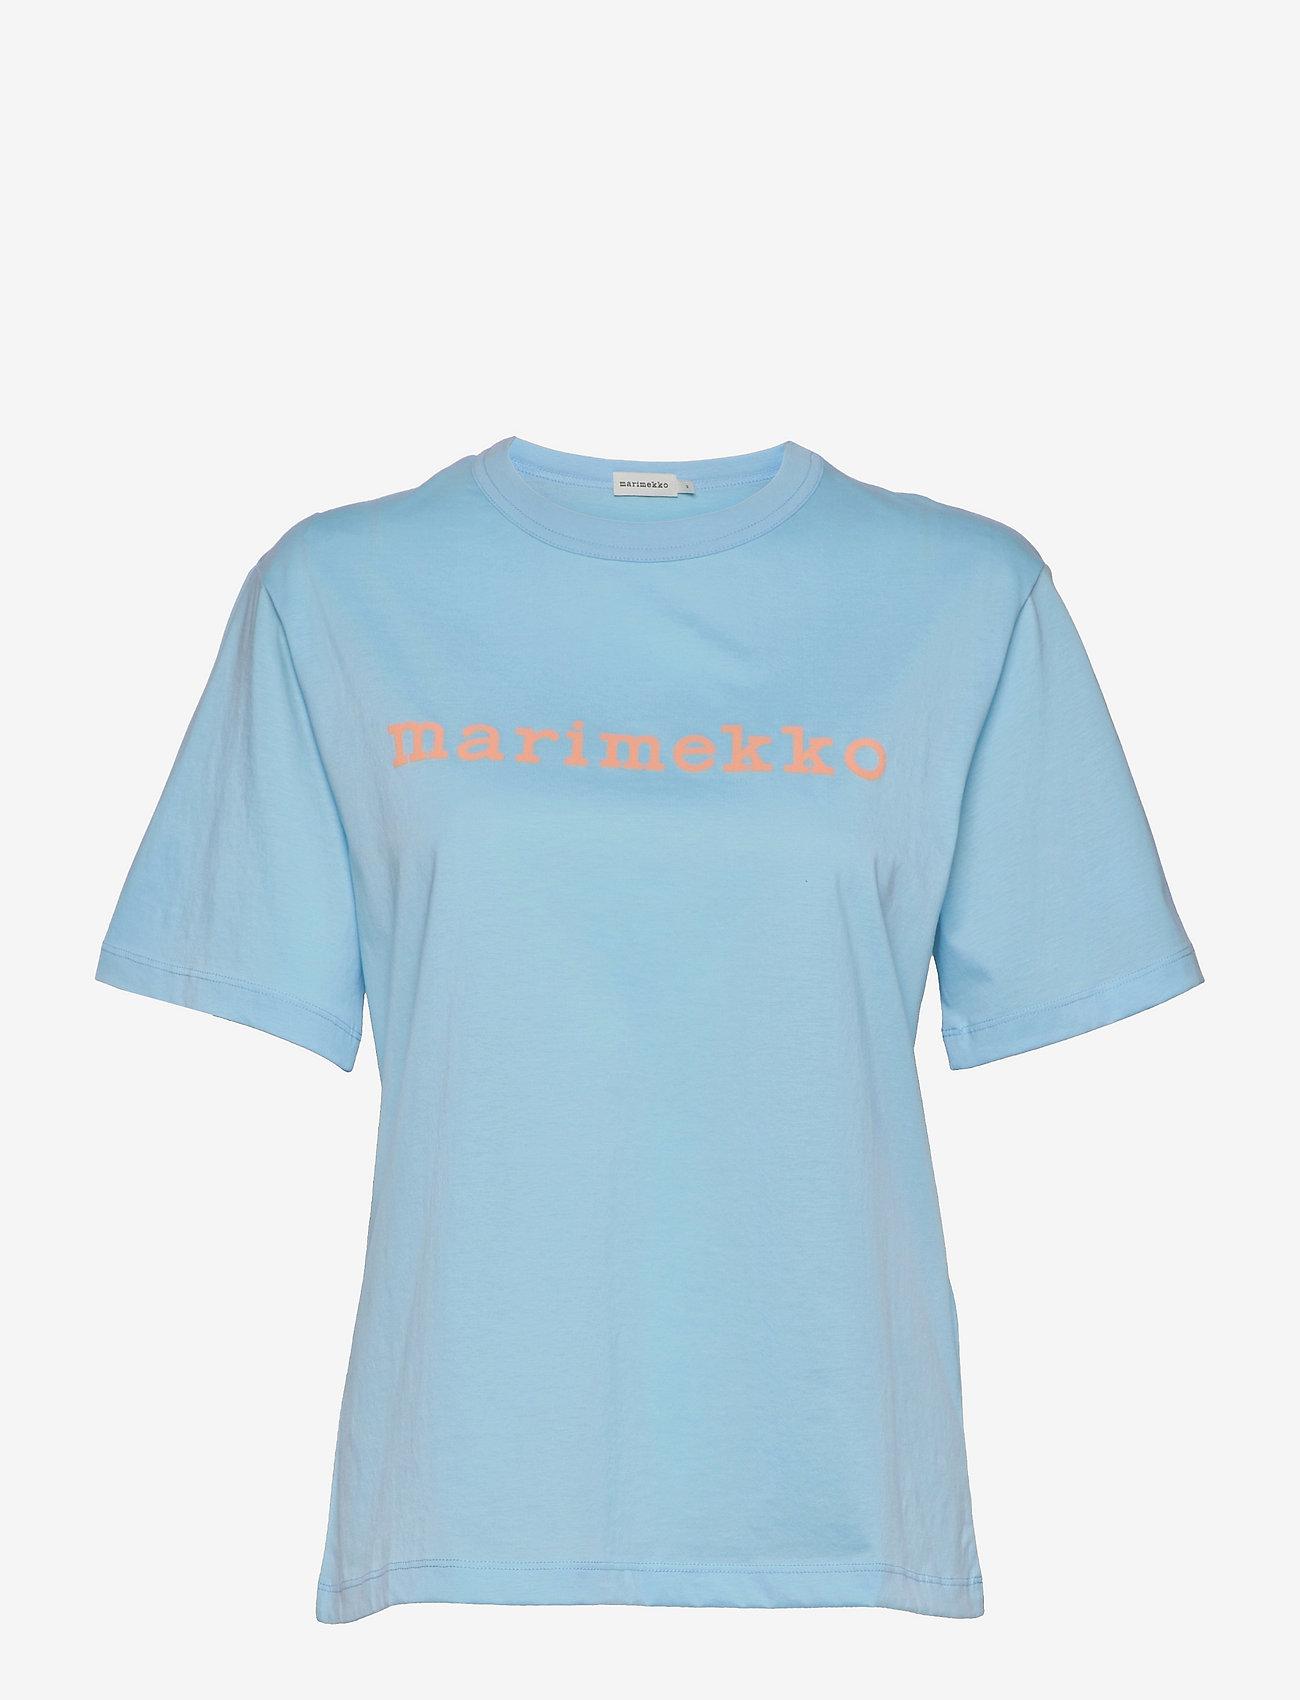 Marimekko - KAPINA LOGO T-SHIRT - t-shirts - light blue, light peach - 0